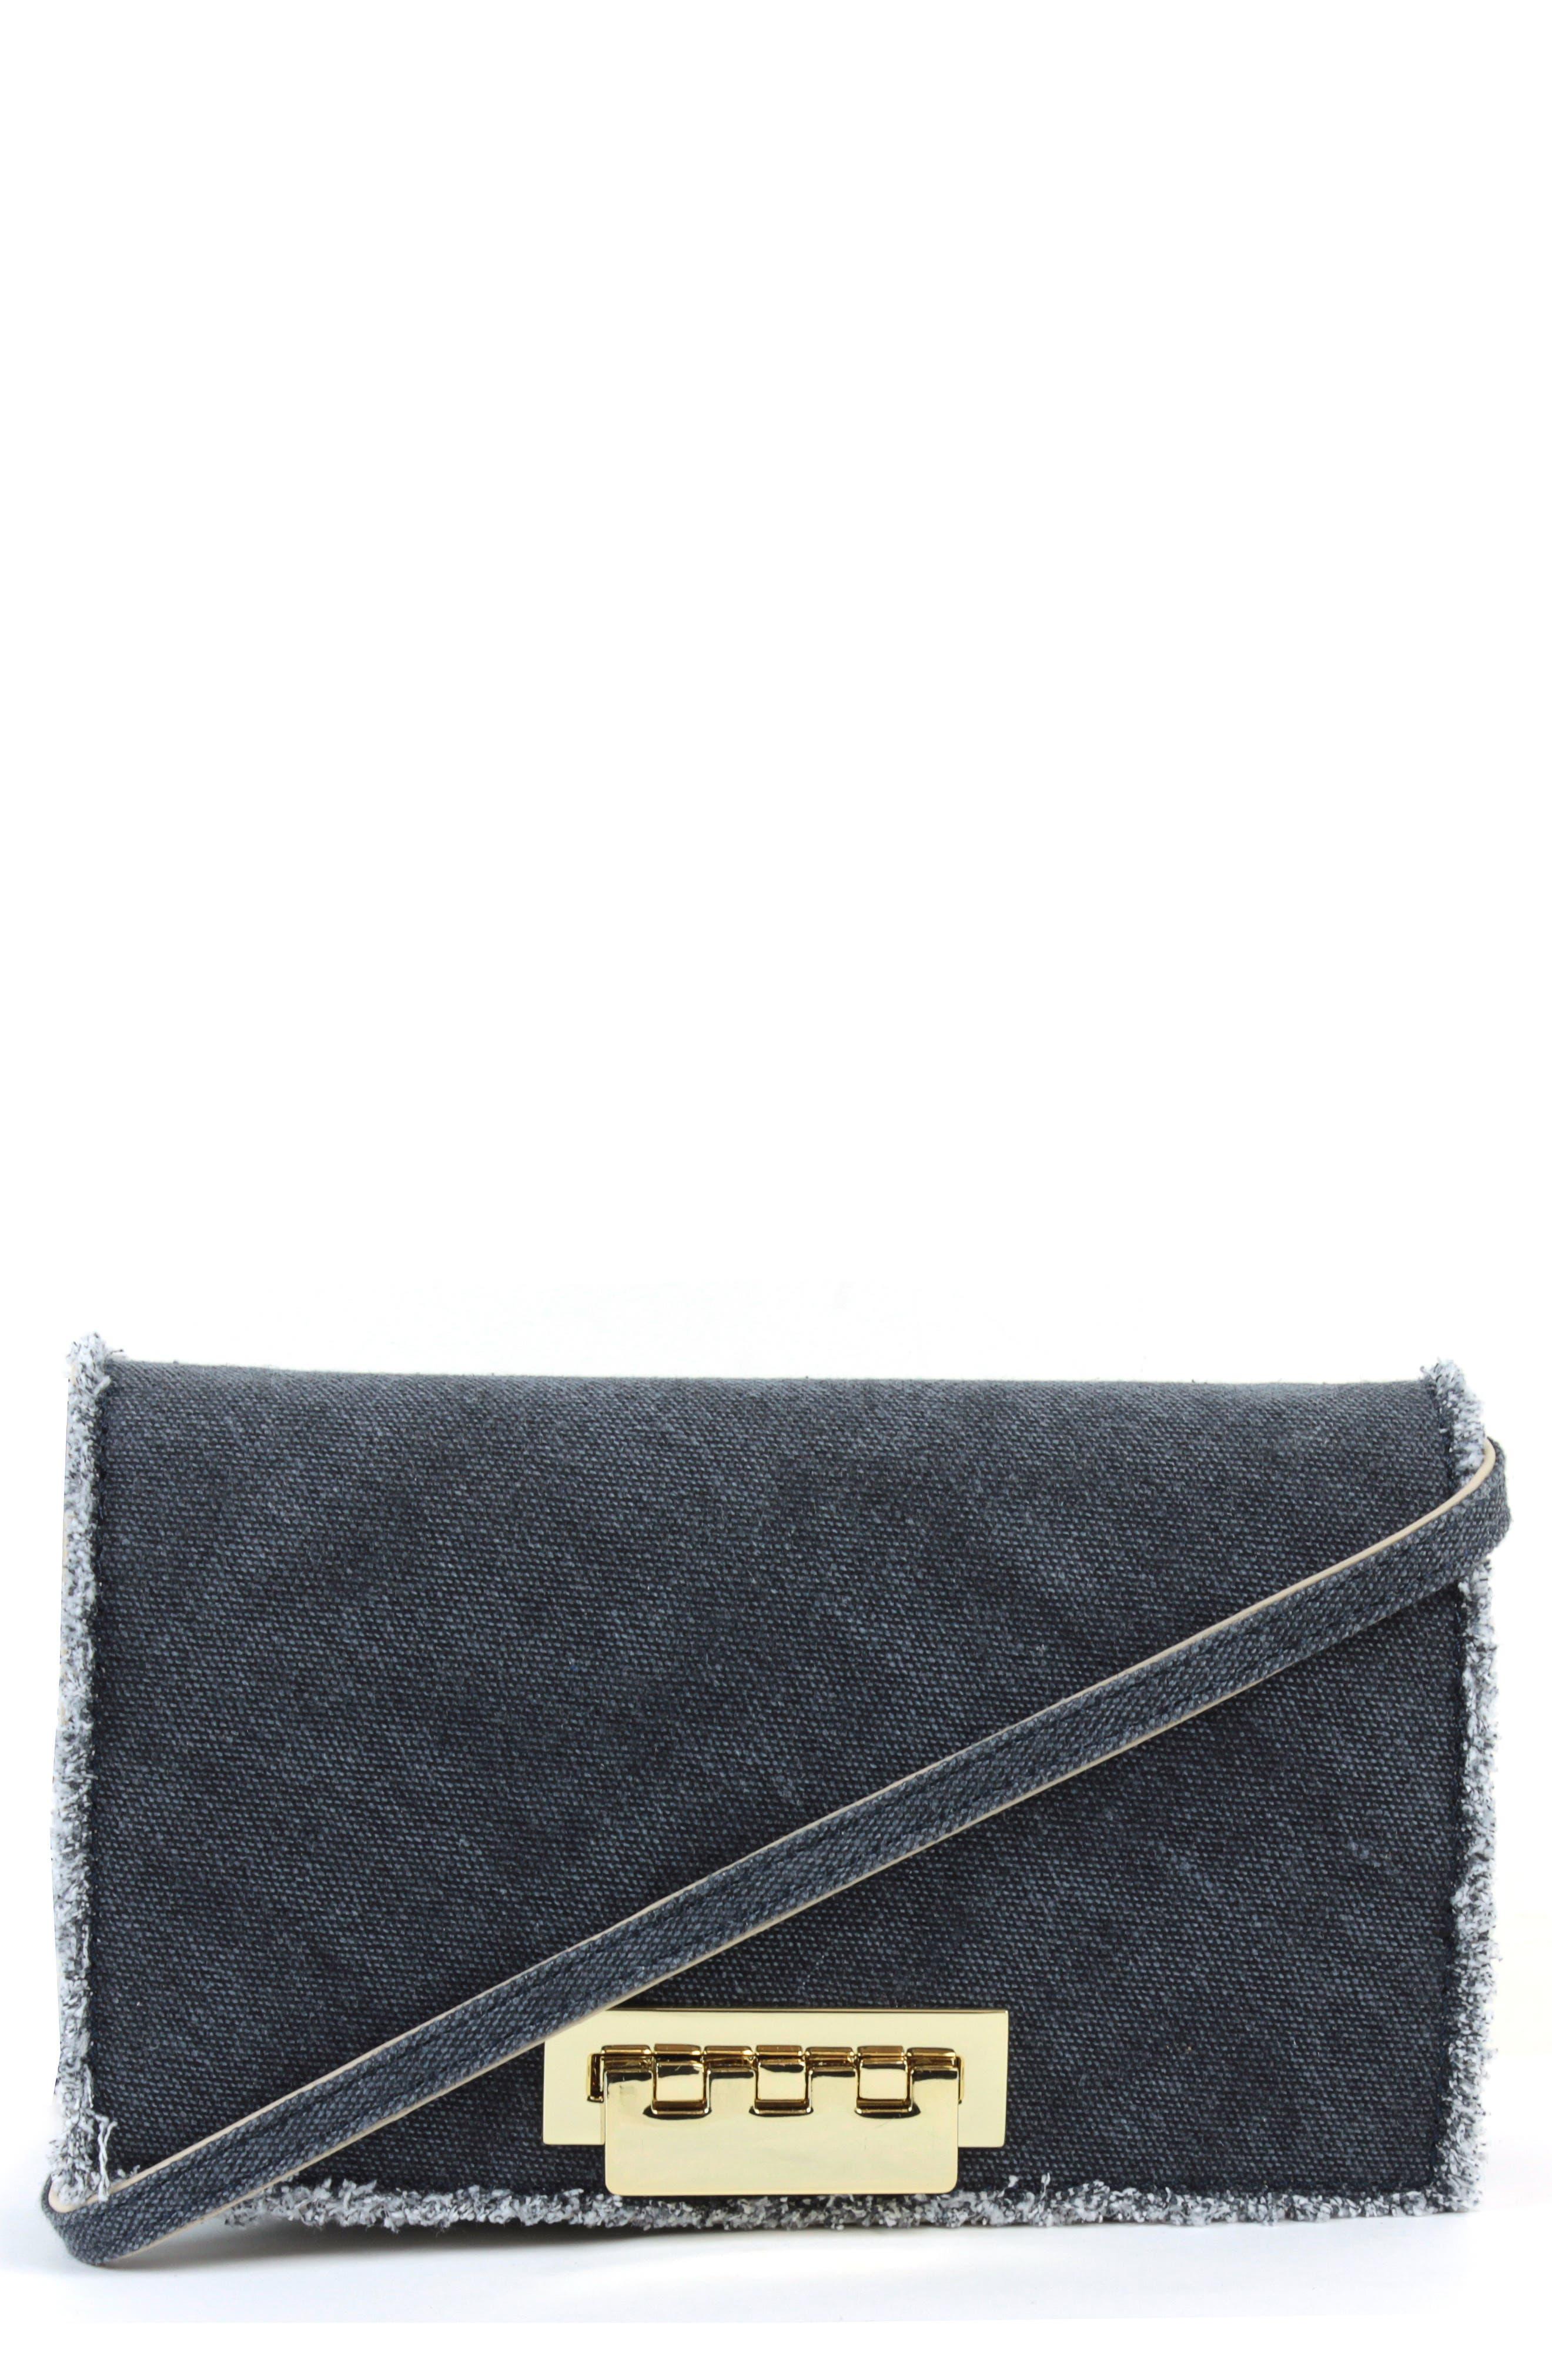 ZAC Zac Posen Earthette Denim Crossbody Bag